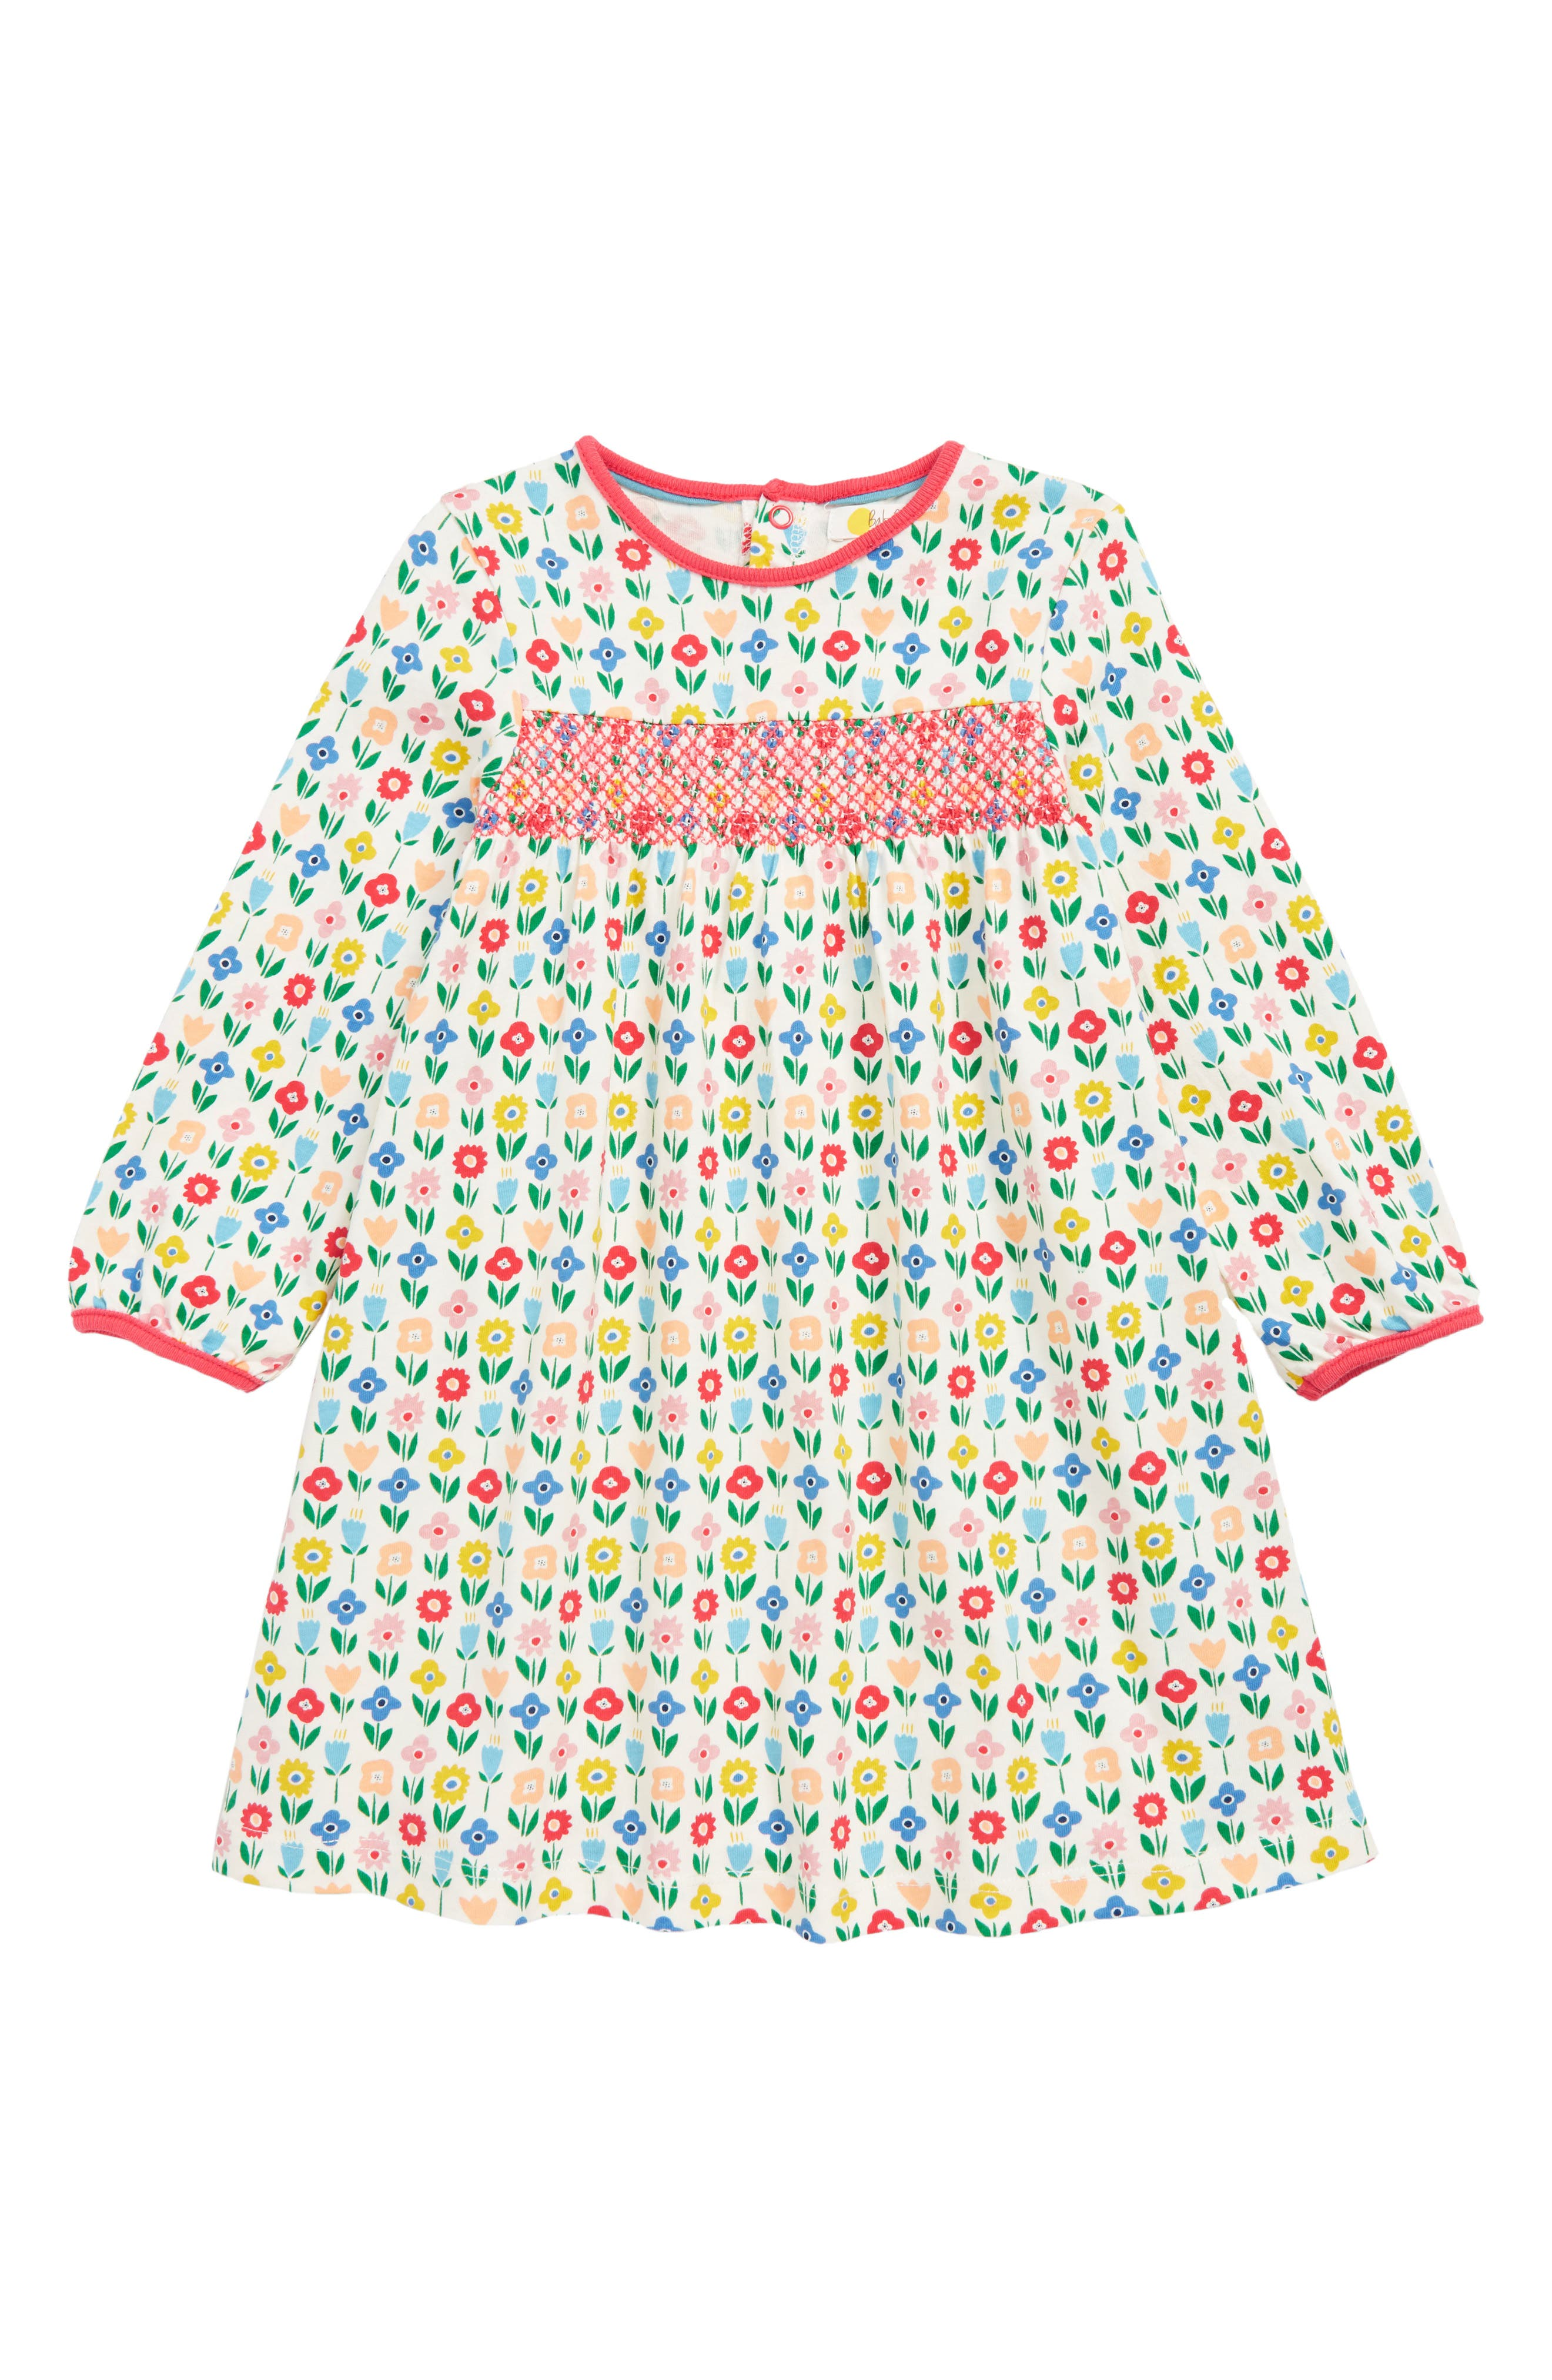 56dc0c1aa Mini Boden Girls  Clothing